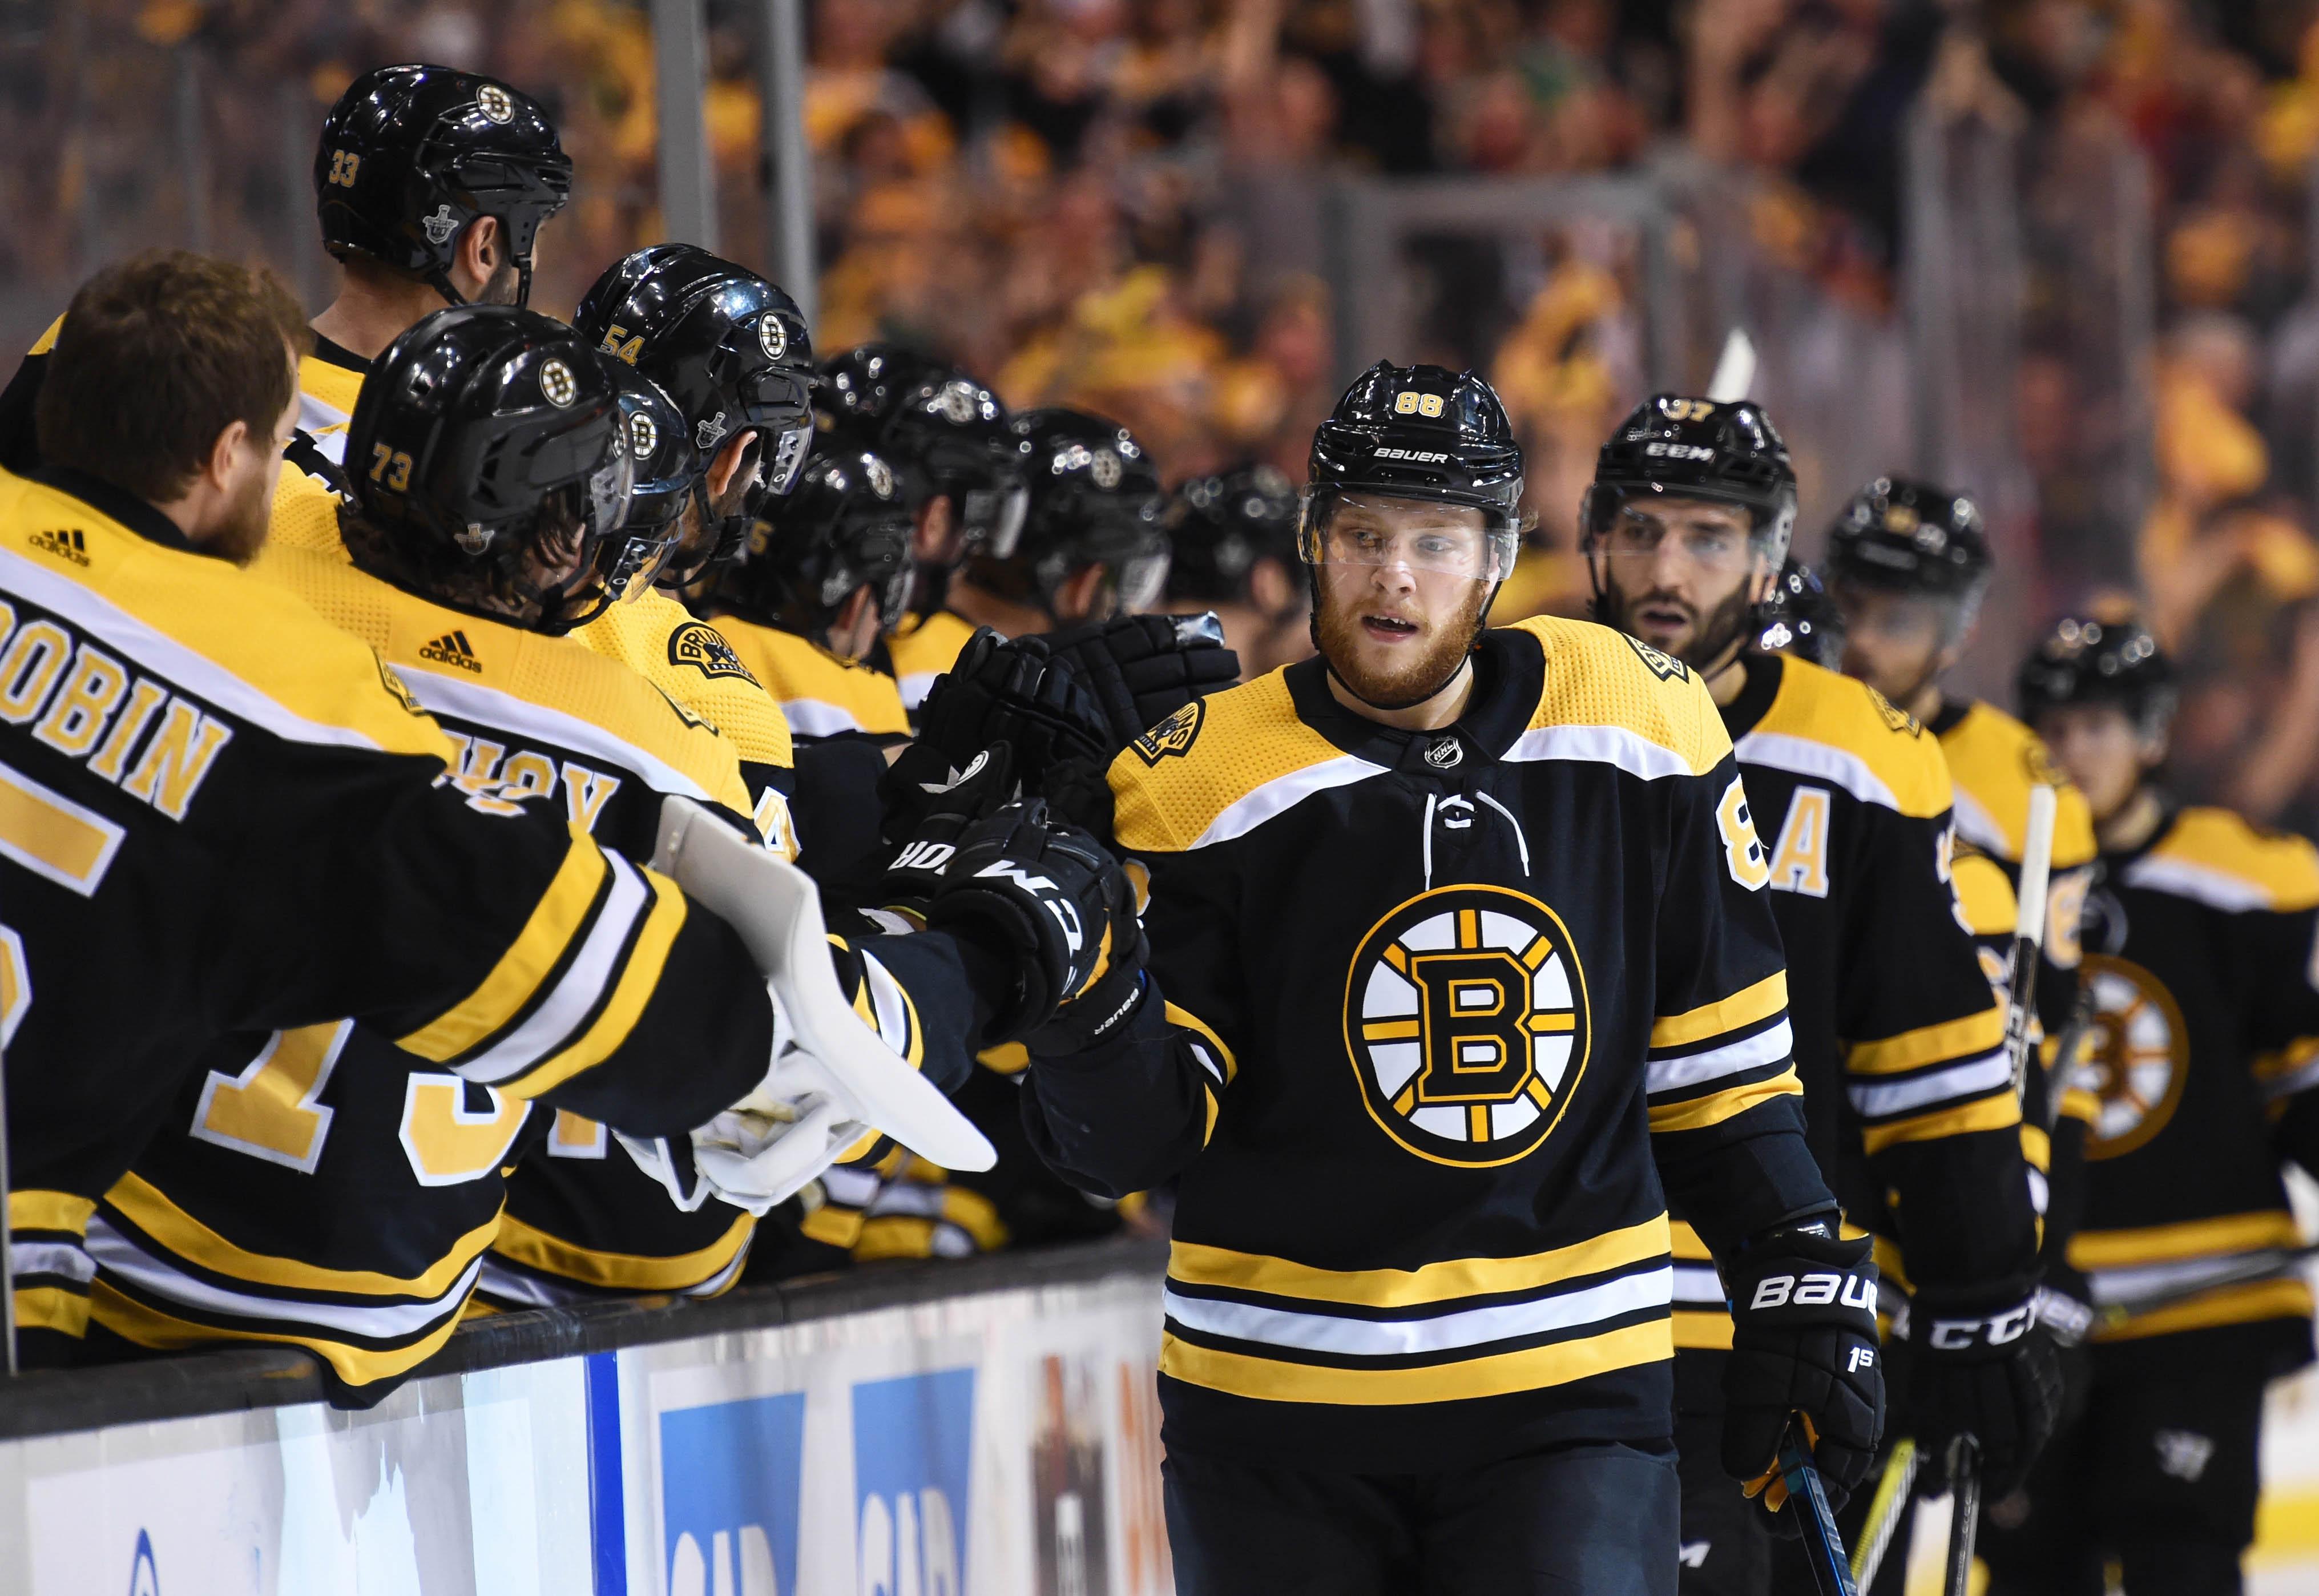 NHL: Stanley Cup Playoffs-Tampa Bay Lightning at Boston Bruins